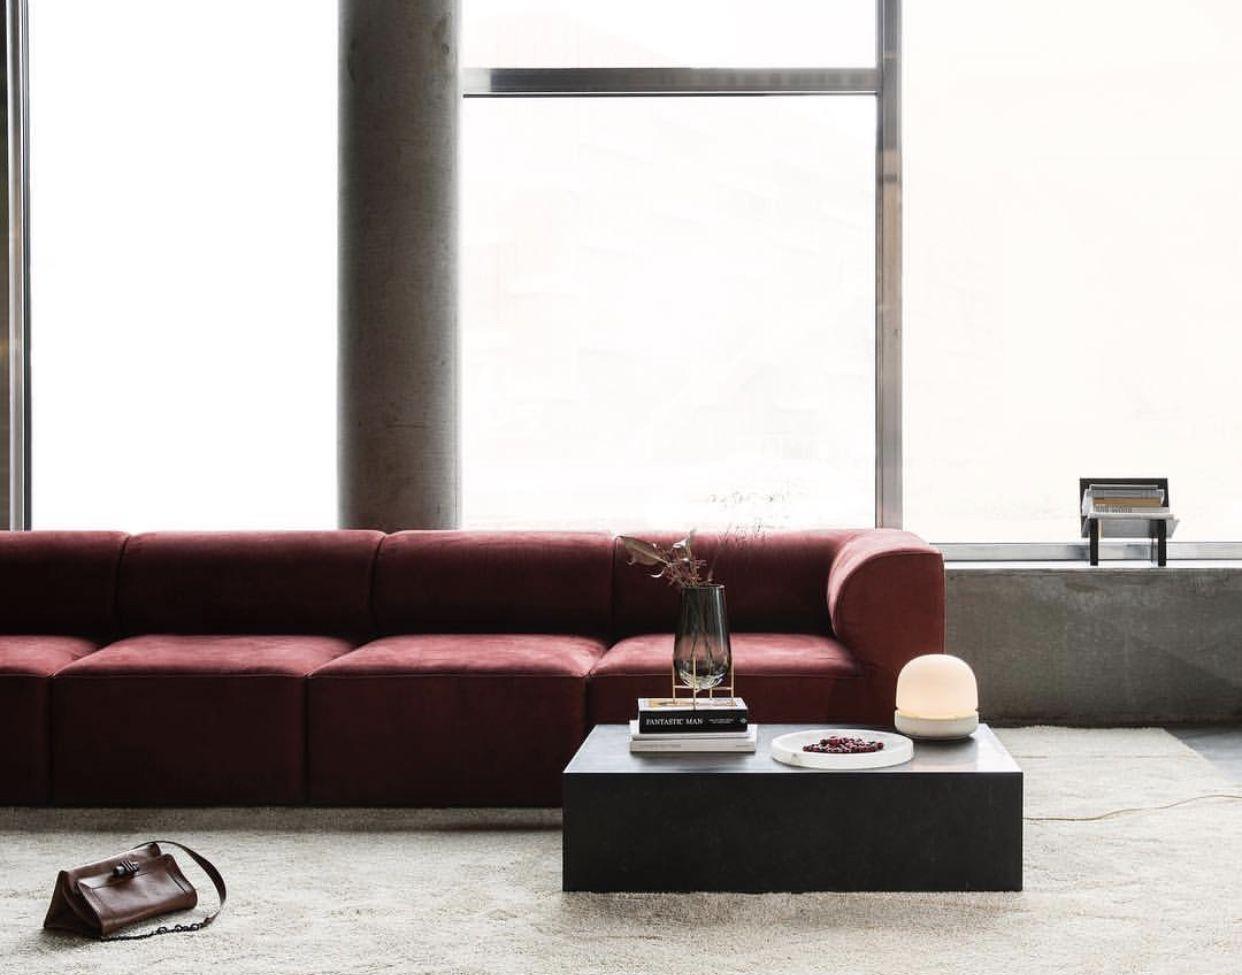 Fredrik Werner Menuworld Modular Sofa Furniture Furniture Design